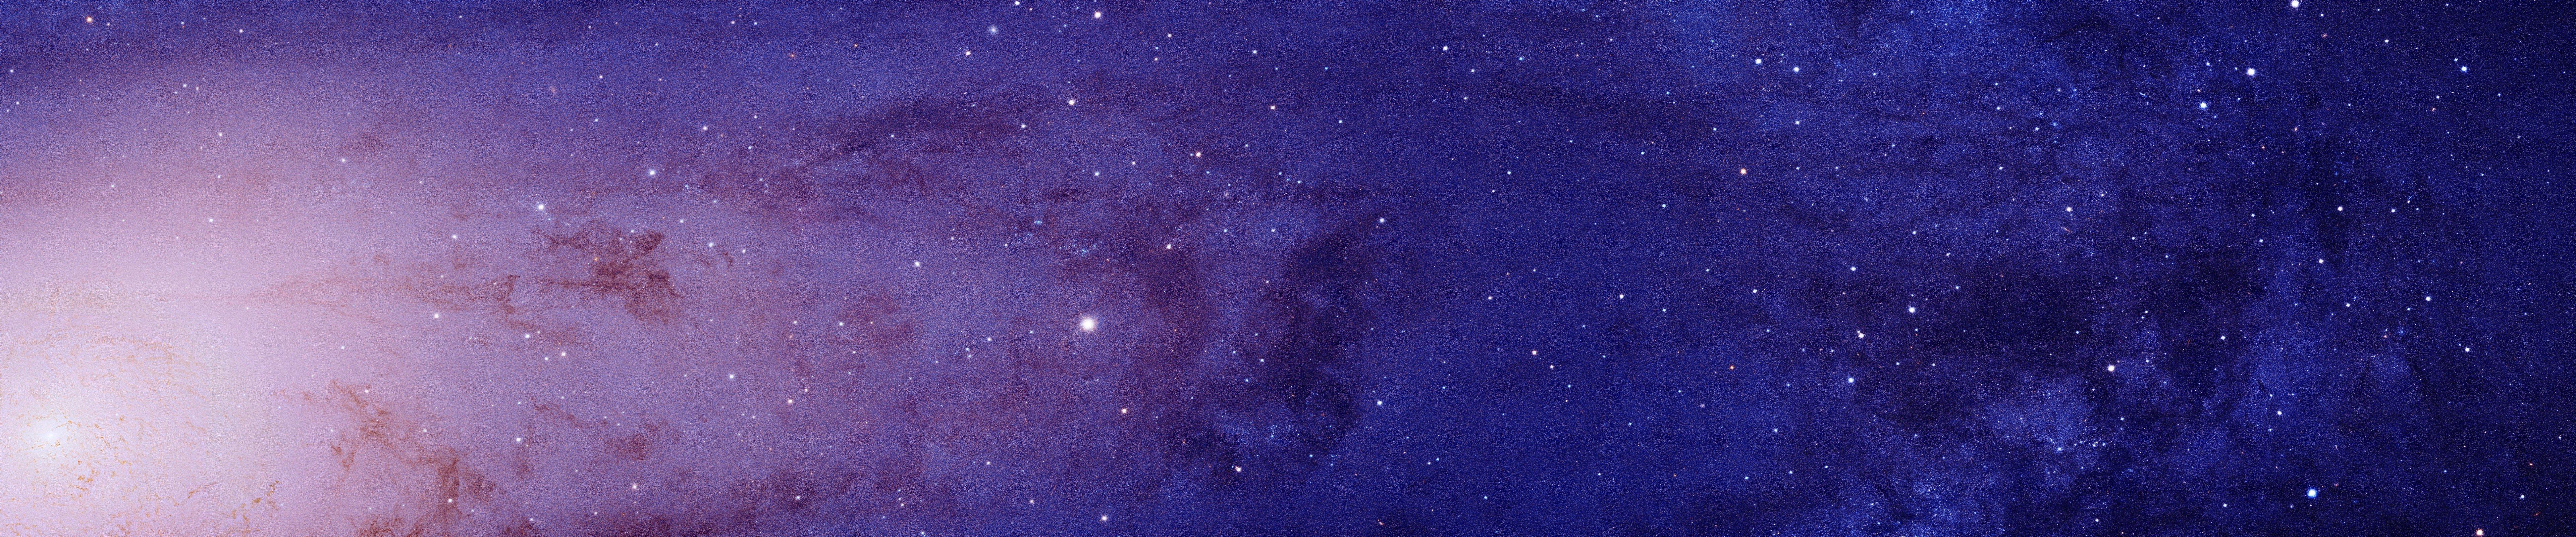 Andromeda, Galaxy, Space, Stars, Closeup, Multiple display, Triple screen Wallpaper